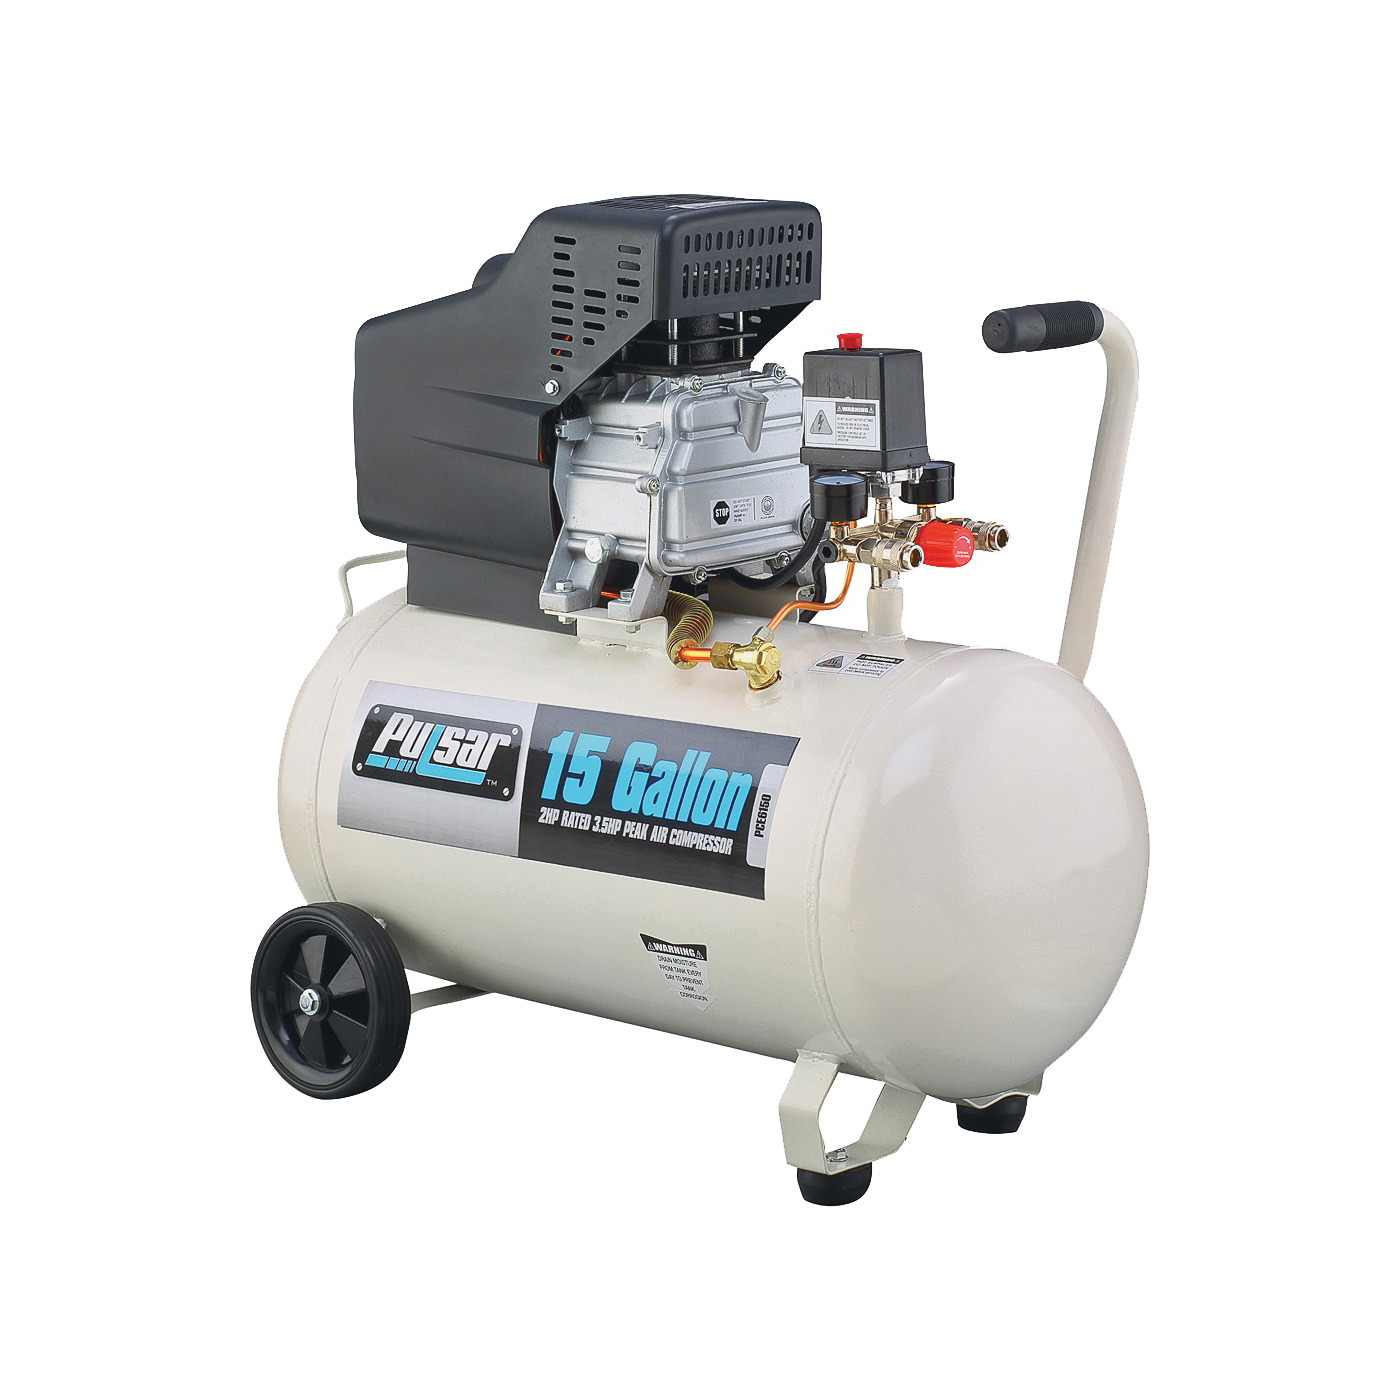 Picture of PULSAR PCE6150 Air Compressor, 15 gal Tank, 3.5 hp, 120 V, 115 psi Pressure, 5.2 cfm Air